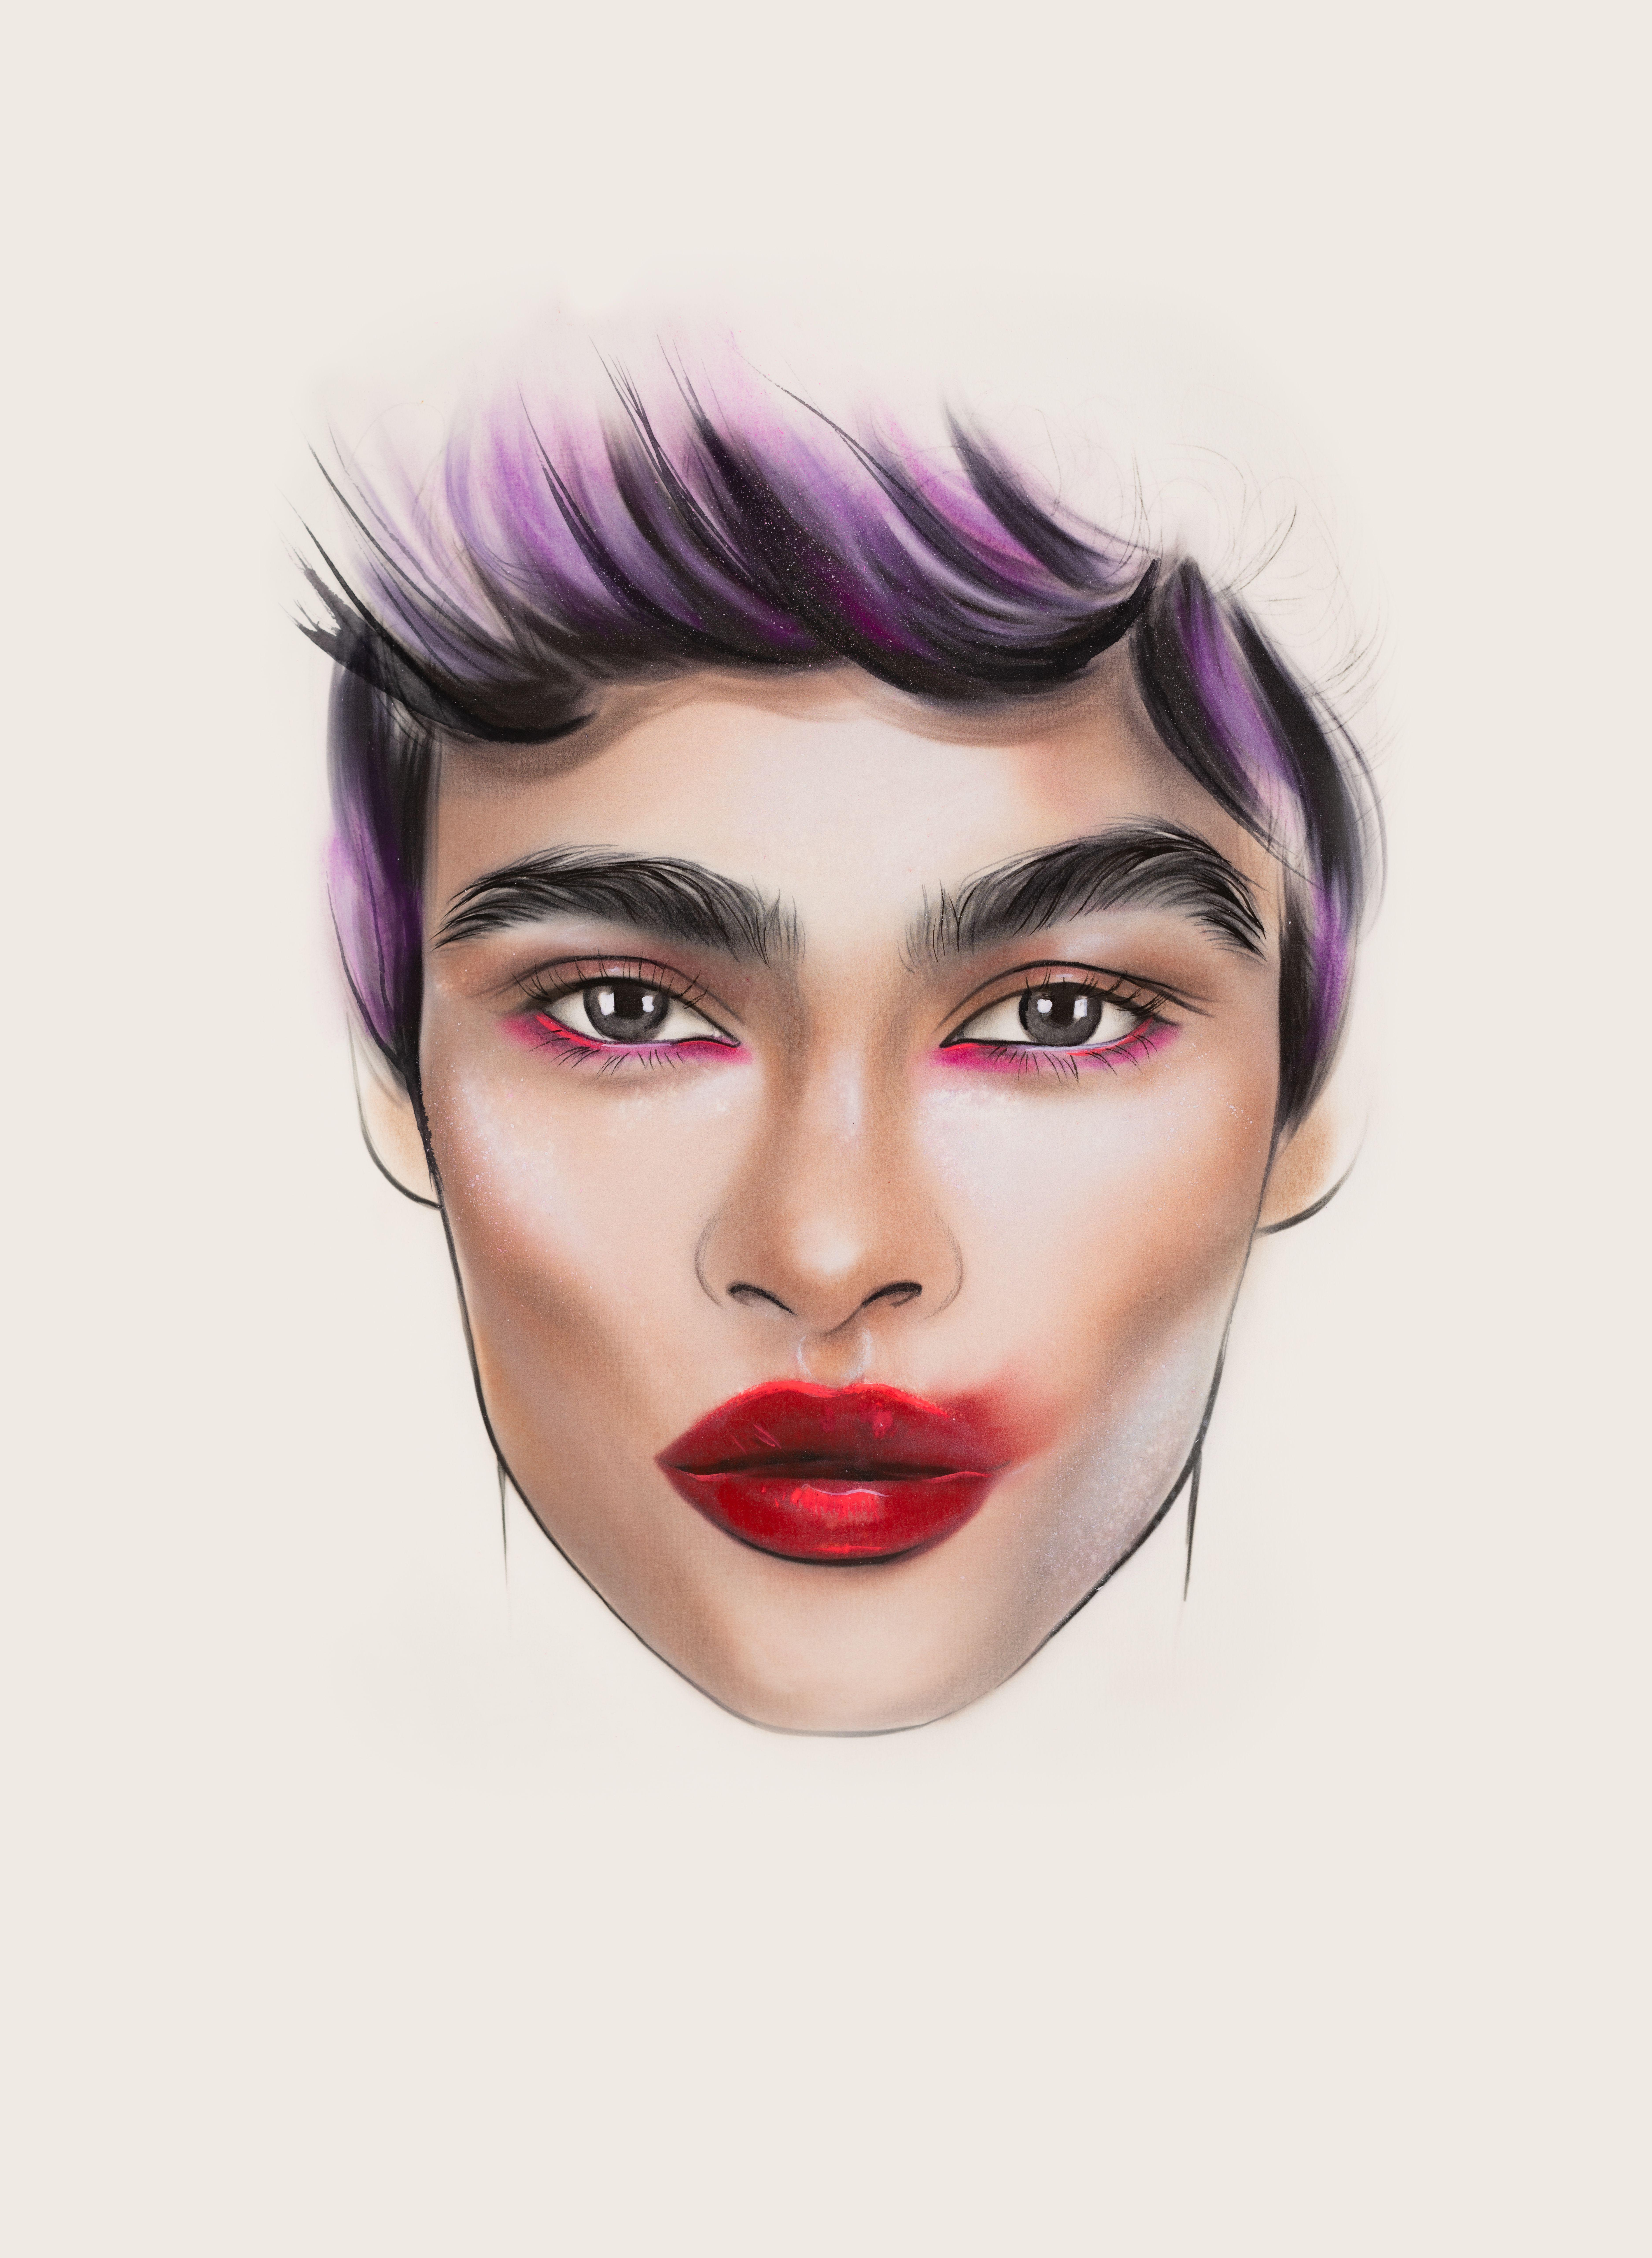 NYX Cosmetics facechart by Liza Kondrevich in 2020 Face